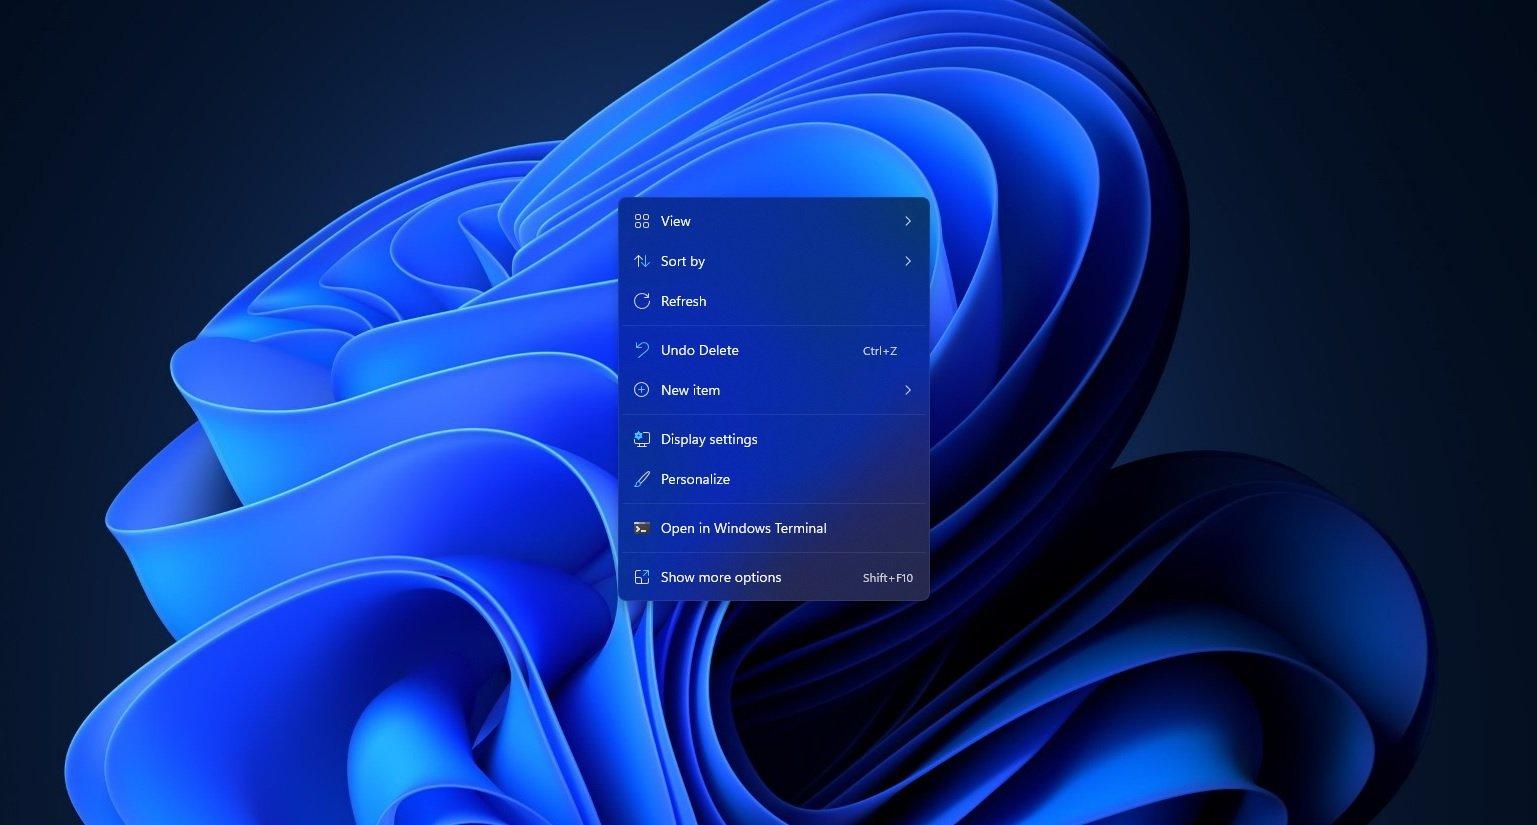 Windows 11 Taskbar view